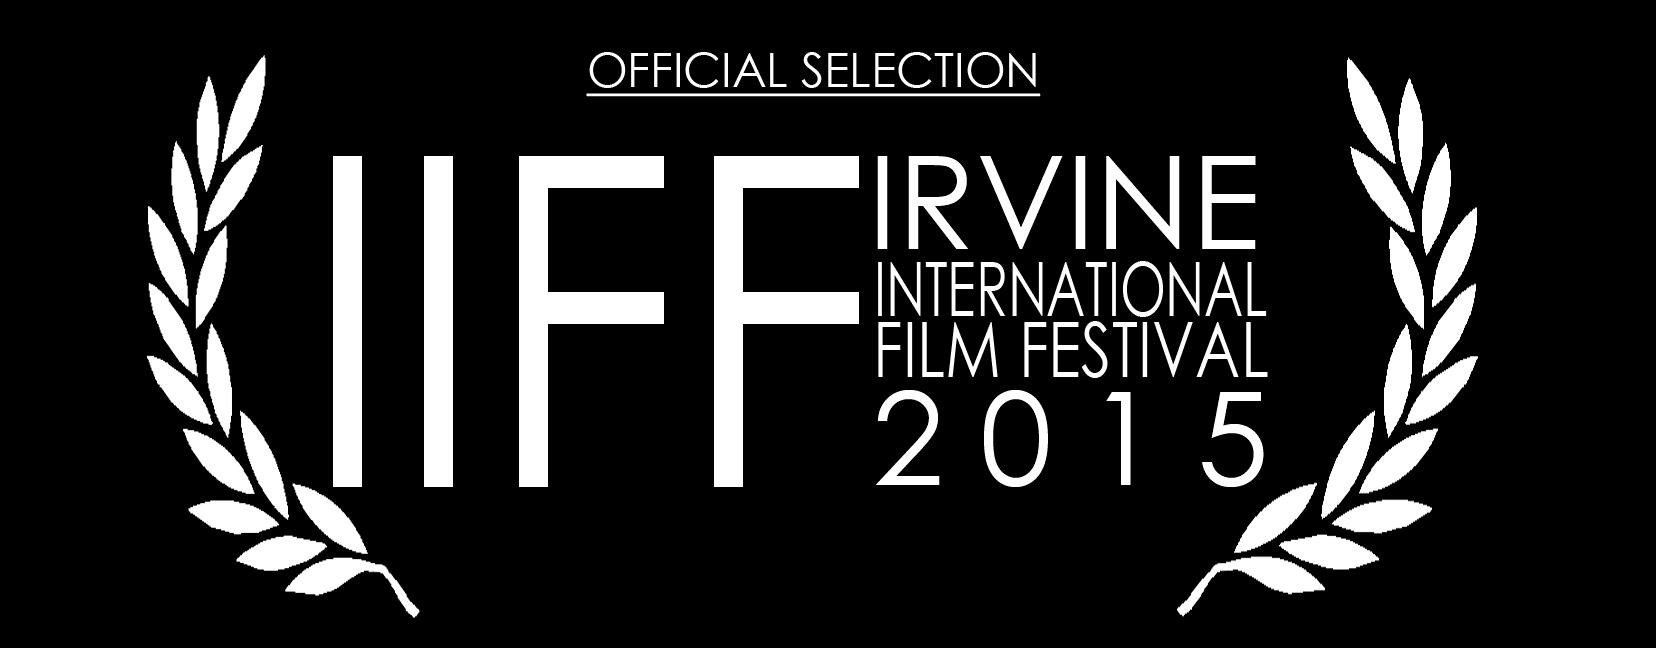 IIFF FILM FEST 15 Black .png